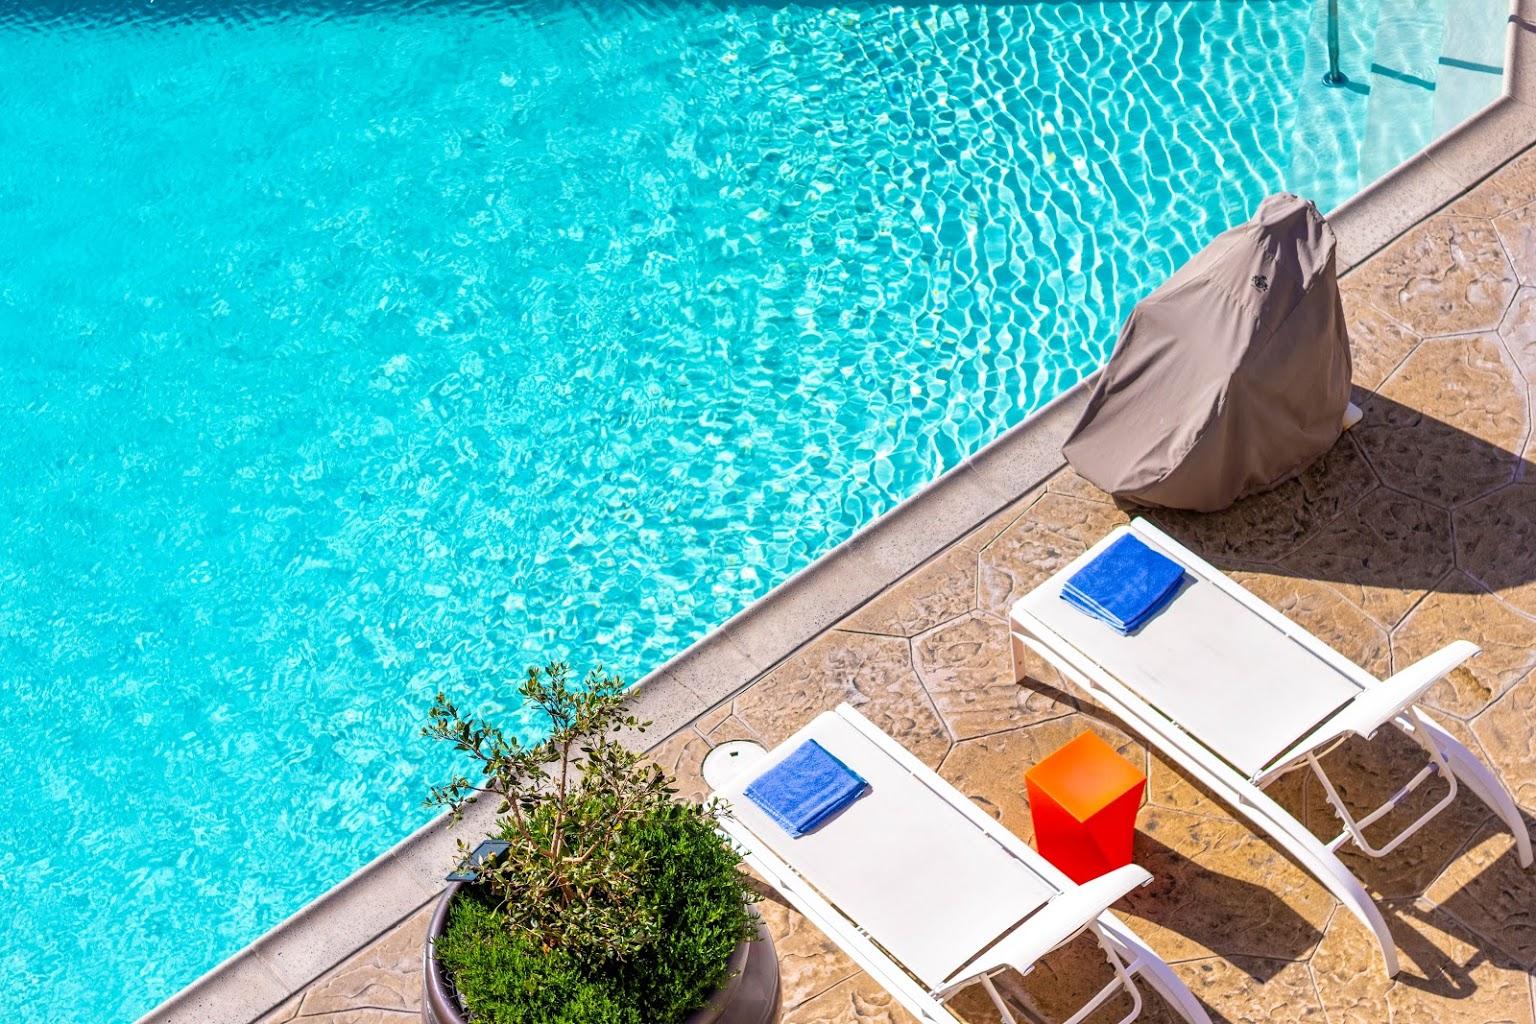 pool-side at Beach Terrace Inn beach-side hotel in Carlsbad, CA